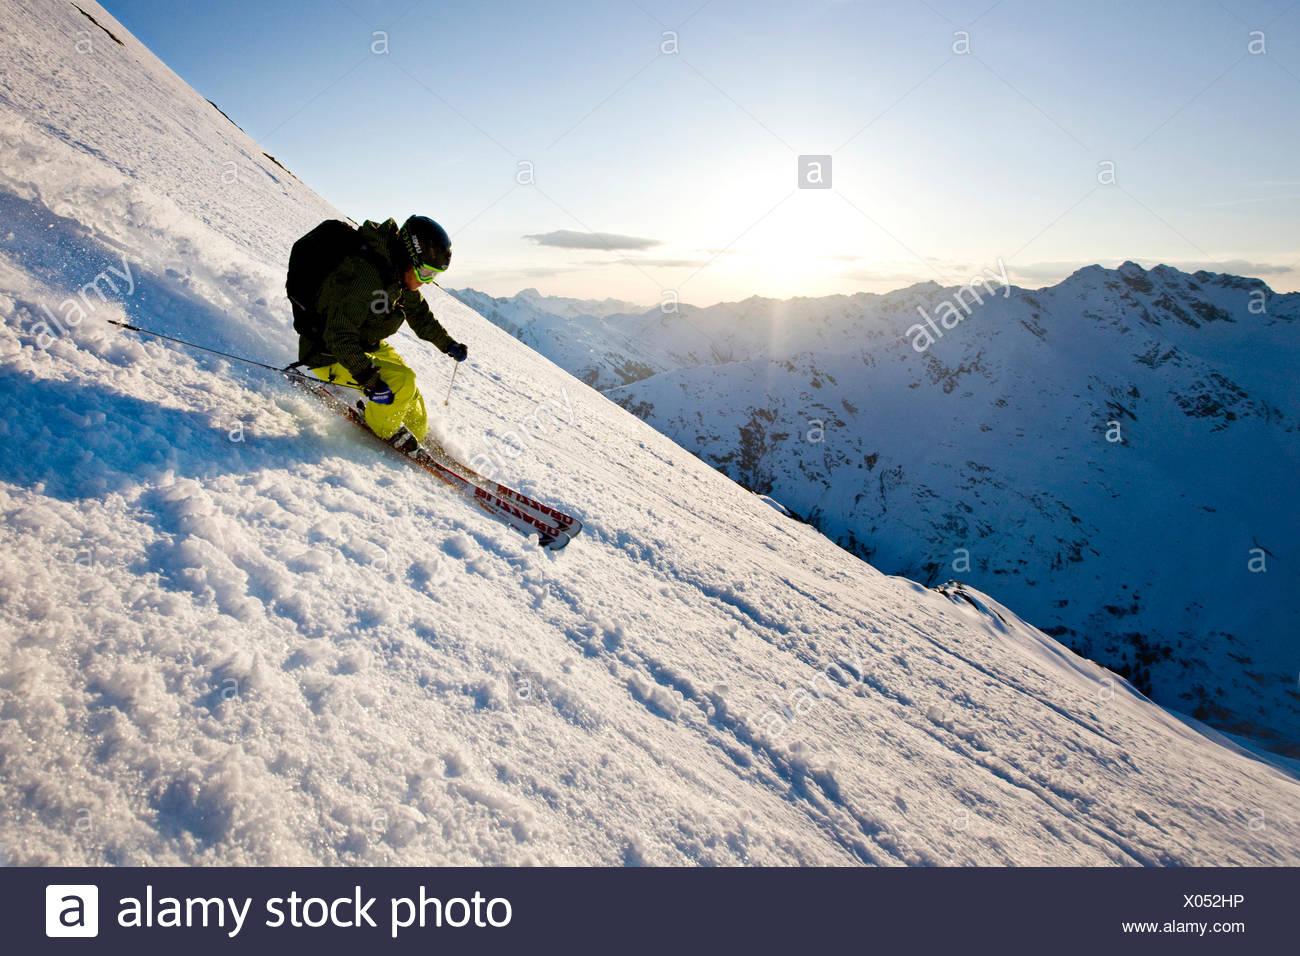 Freeride skier during descent, Arlberg, Verwall Group, North Tyrol, Austria - Stock Image